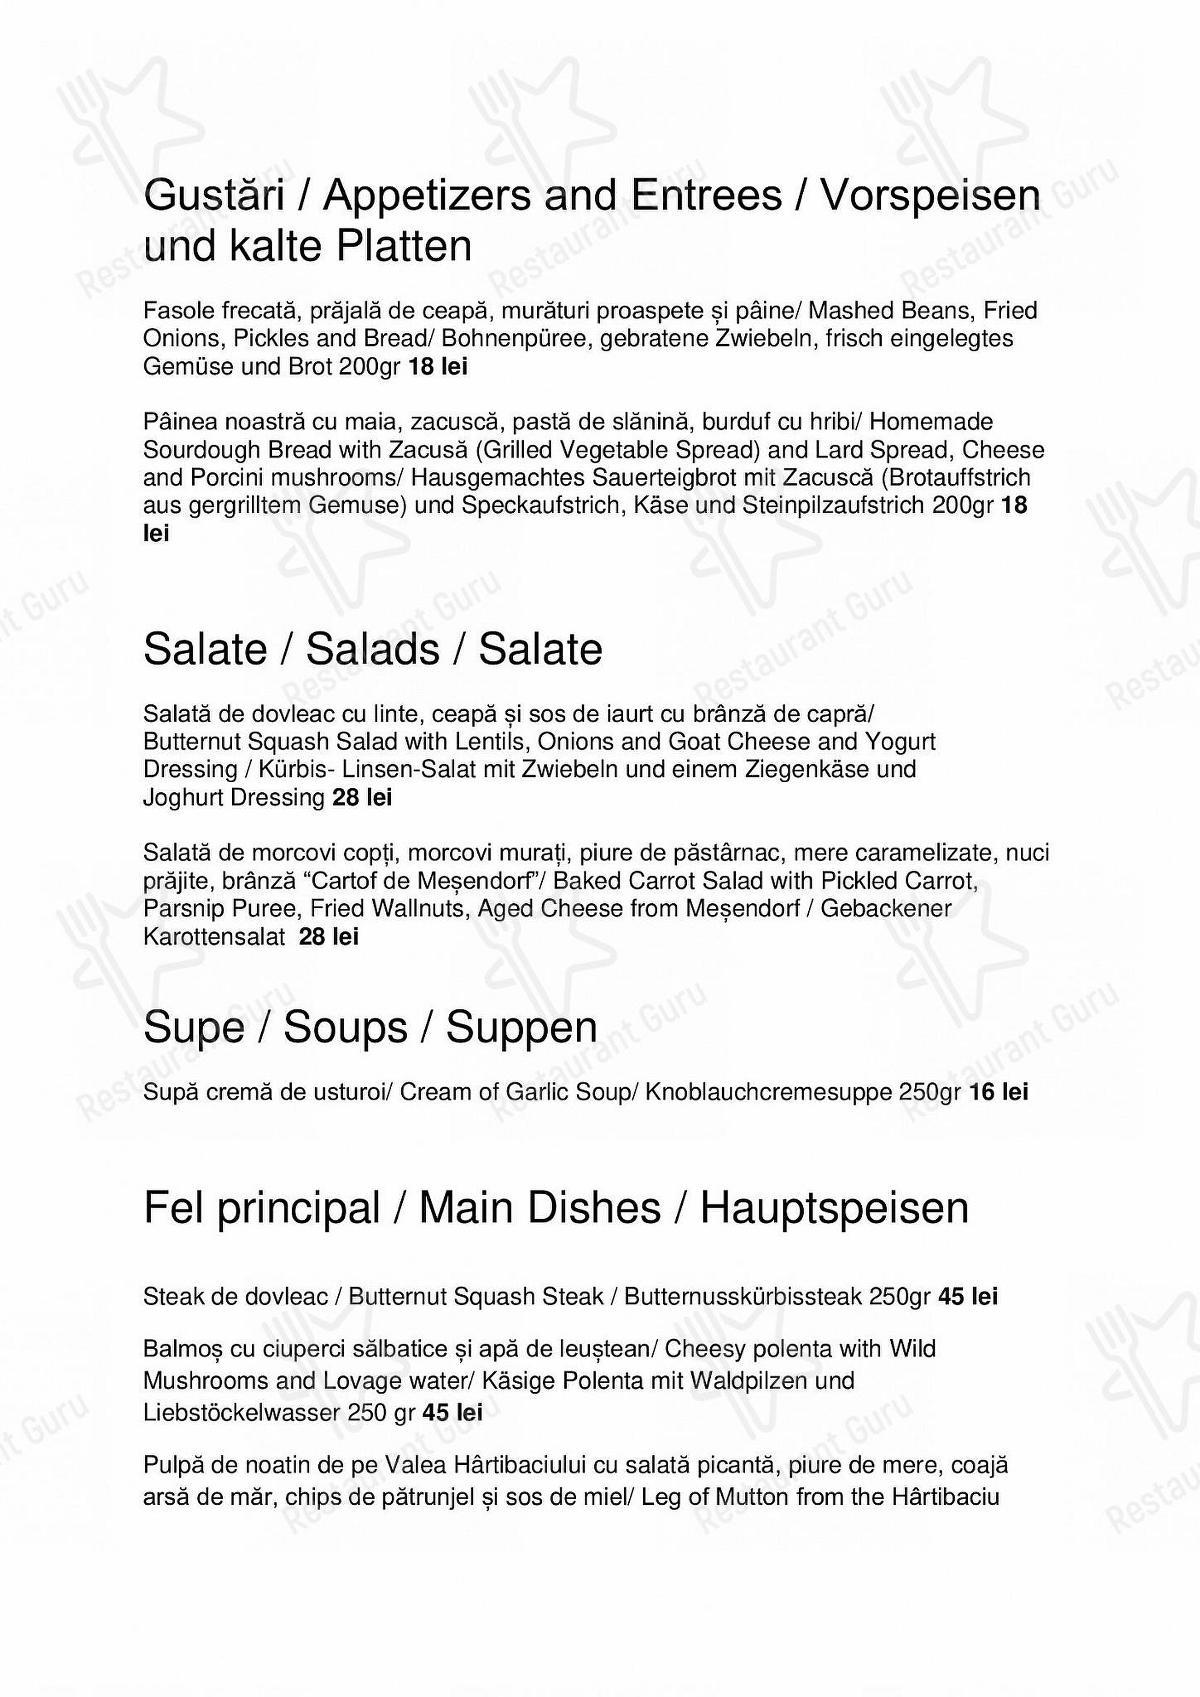 Syndicat Gourmet - Food Menu